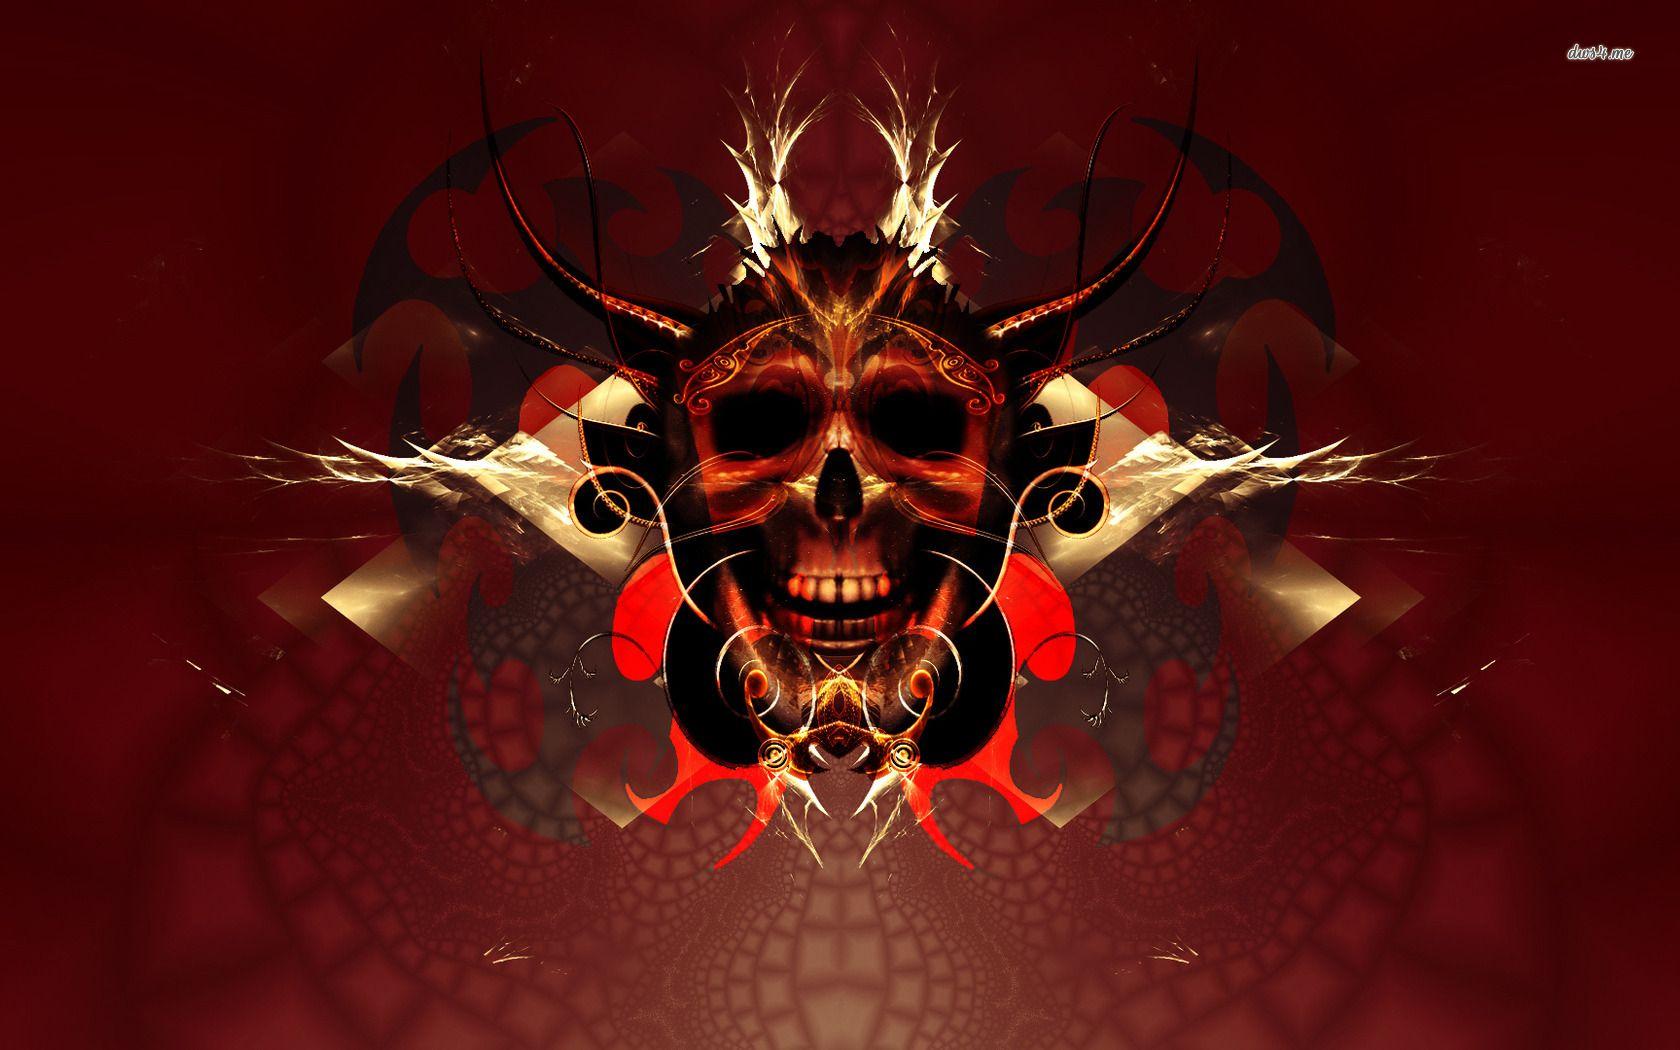 Red Skull Wallpaper Image Cool Punk Wallpaper For Guys